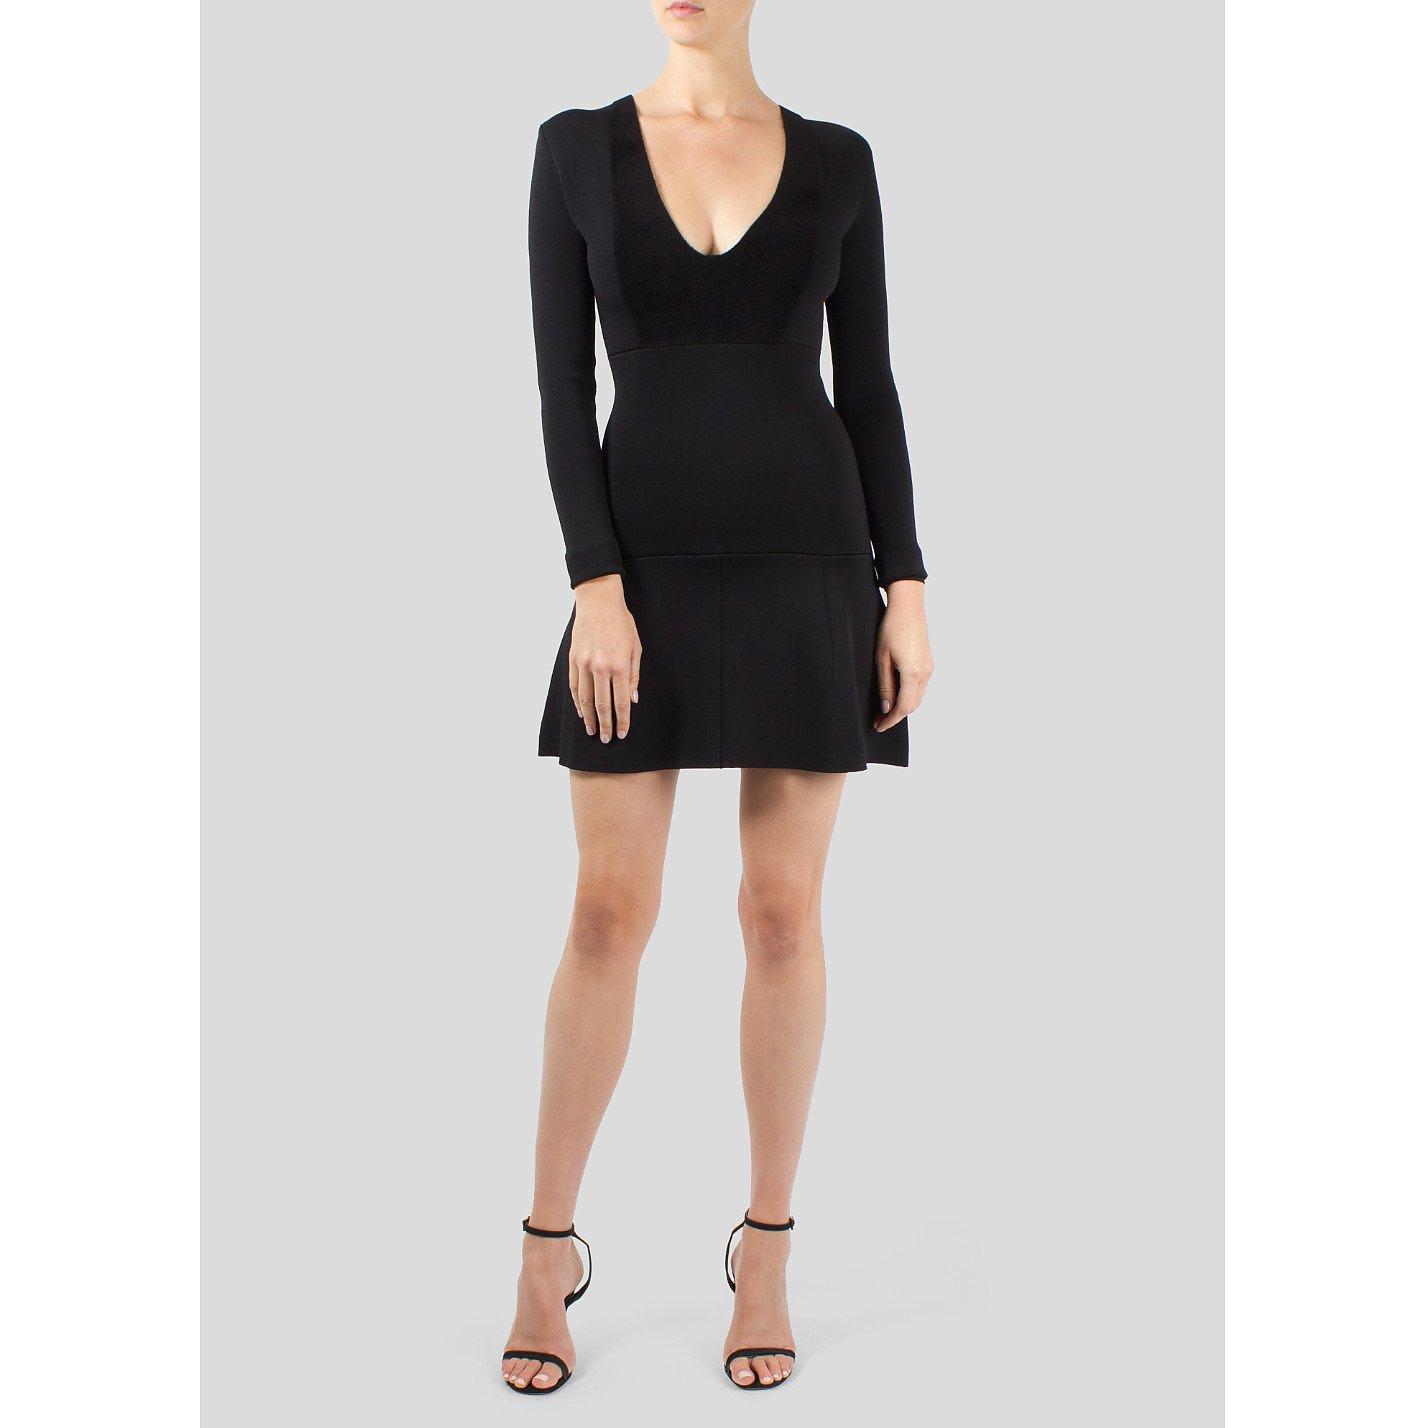 ISSA Mini Dress with Deep V Neck